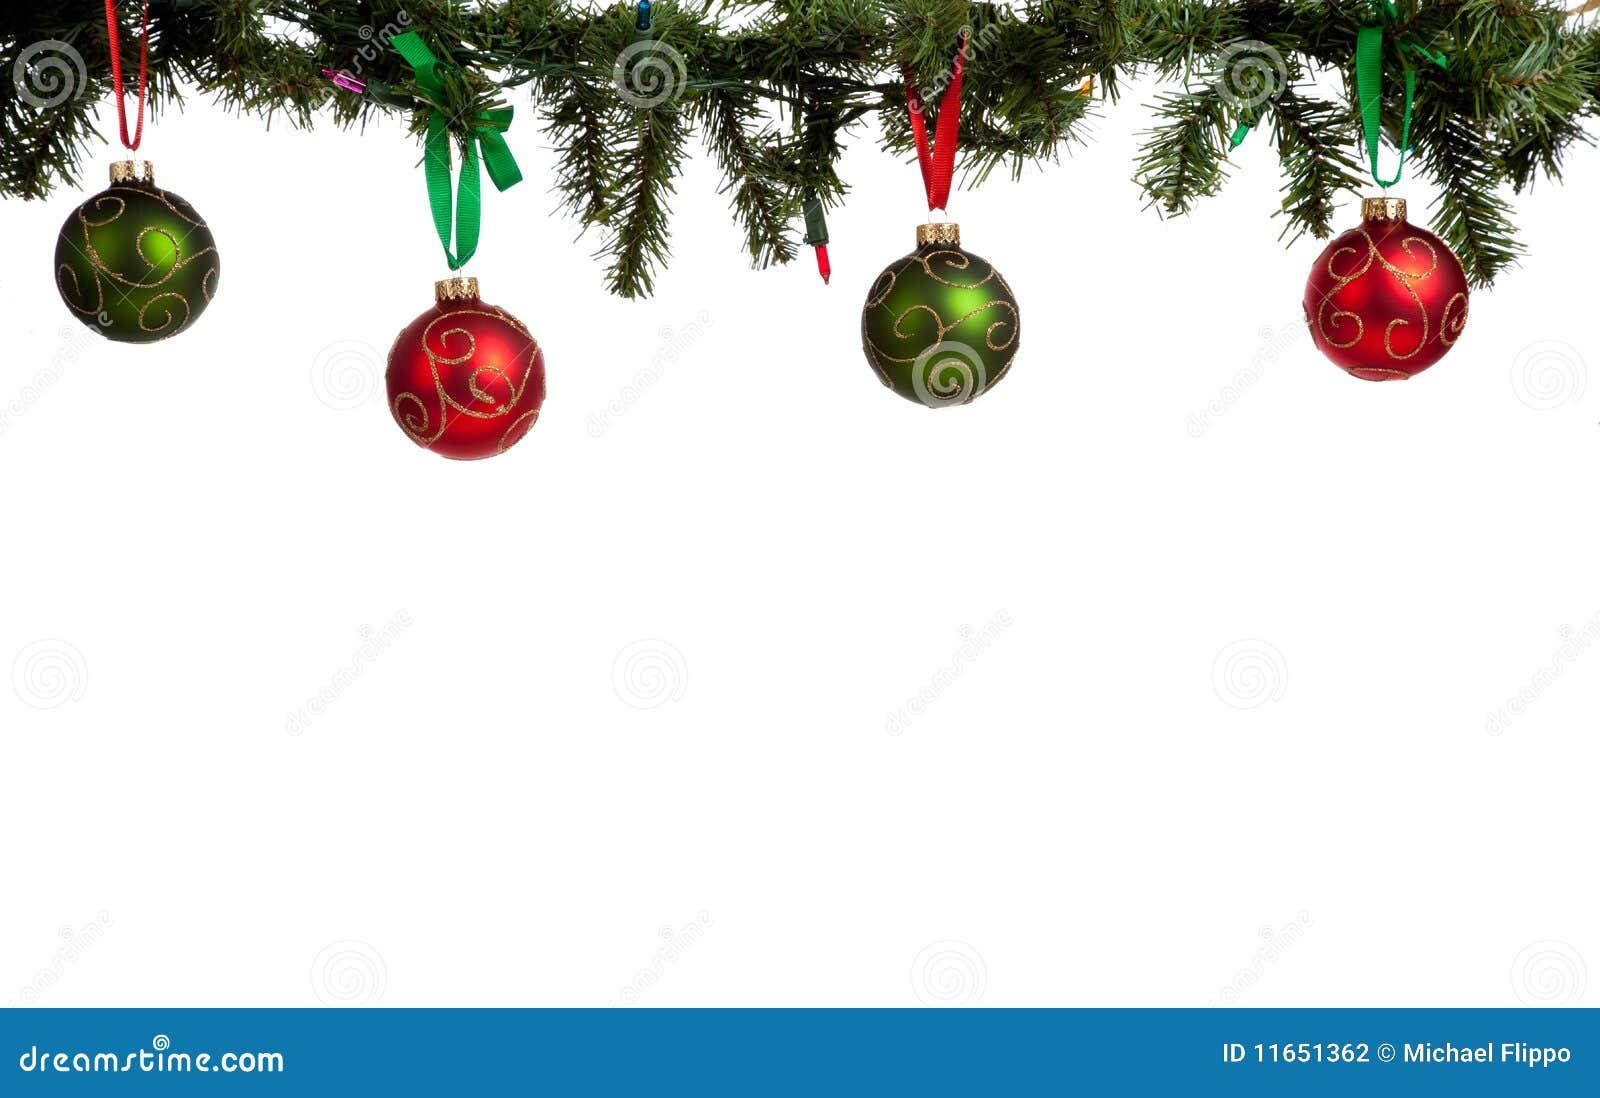 Christmas Garland Border Clip Art A christmas ornament border